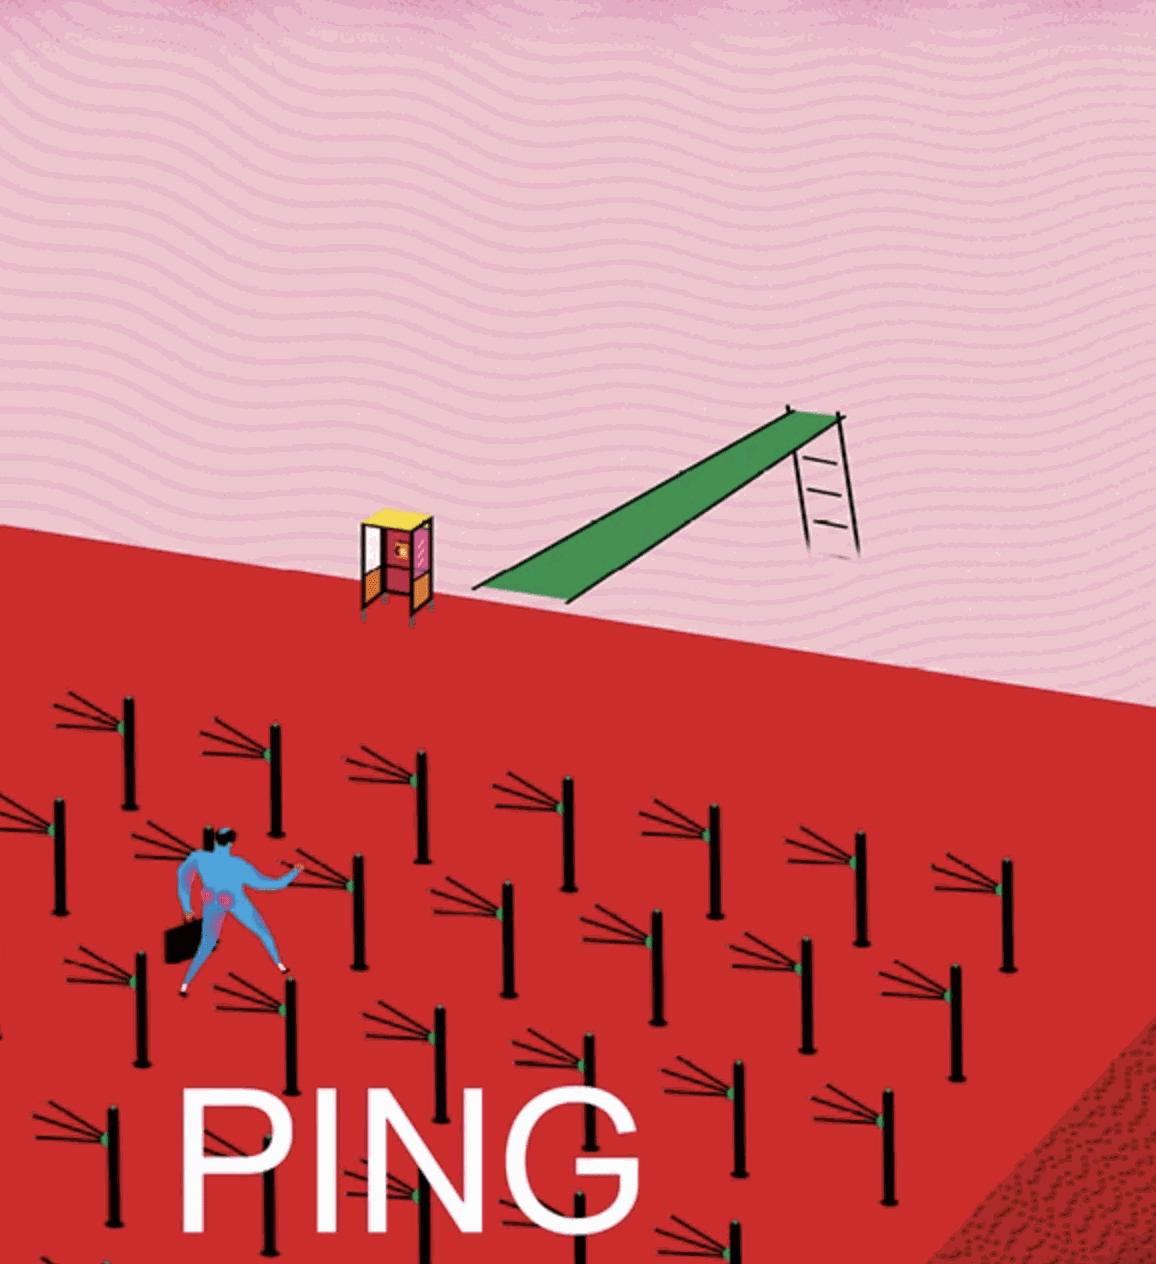 Wong Ping: Your Silent Neighbor